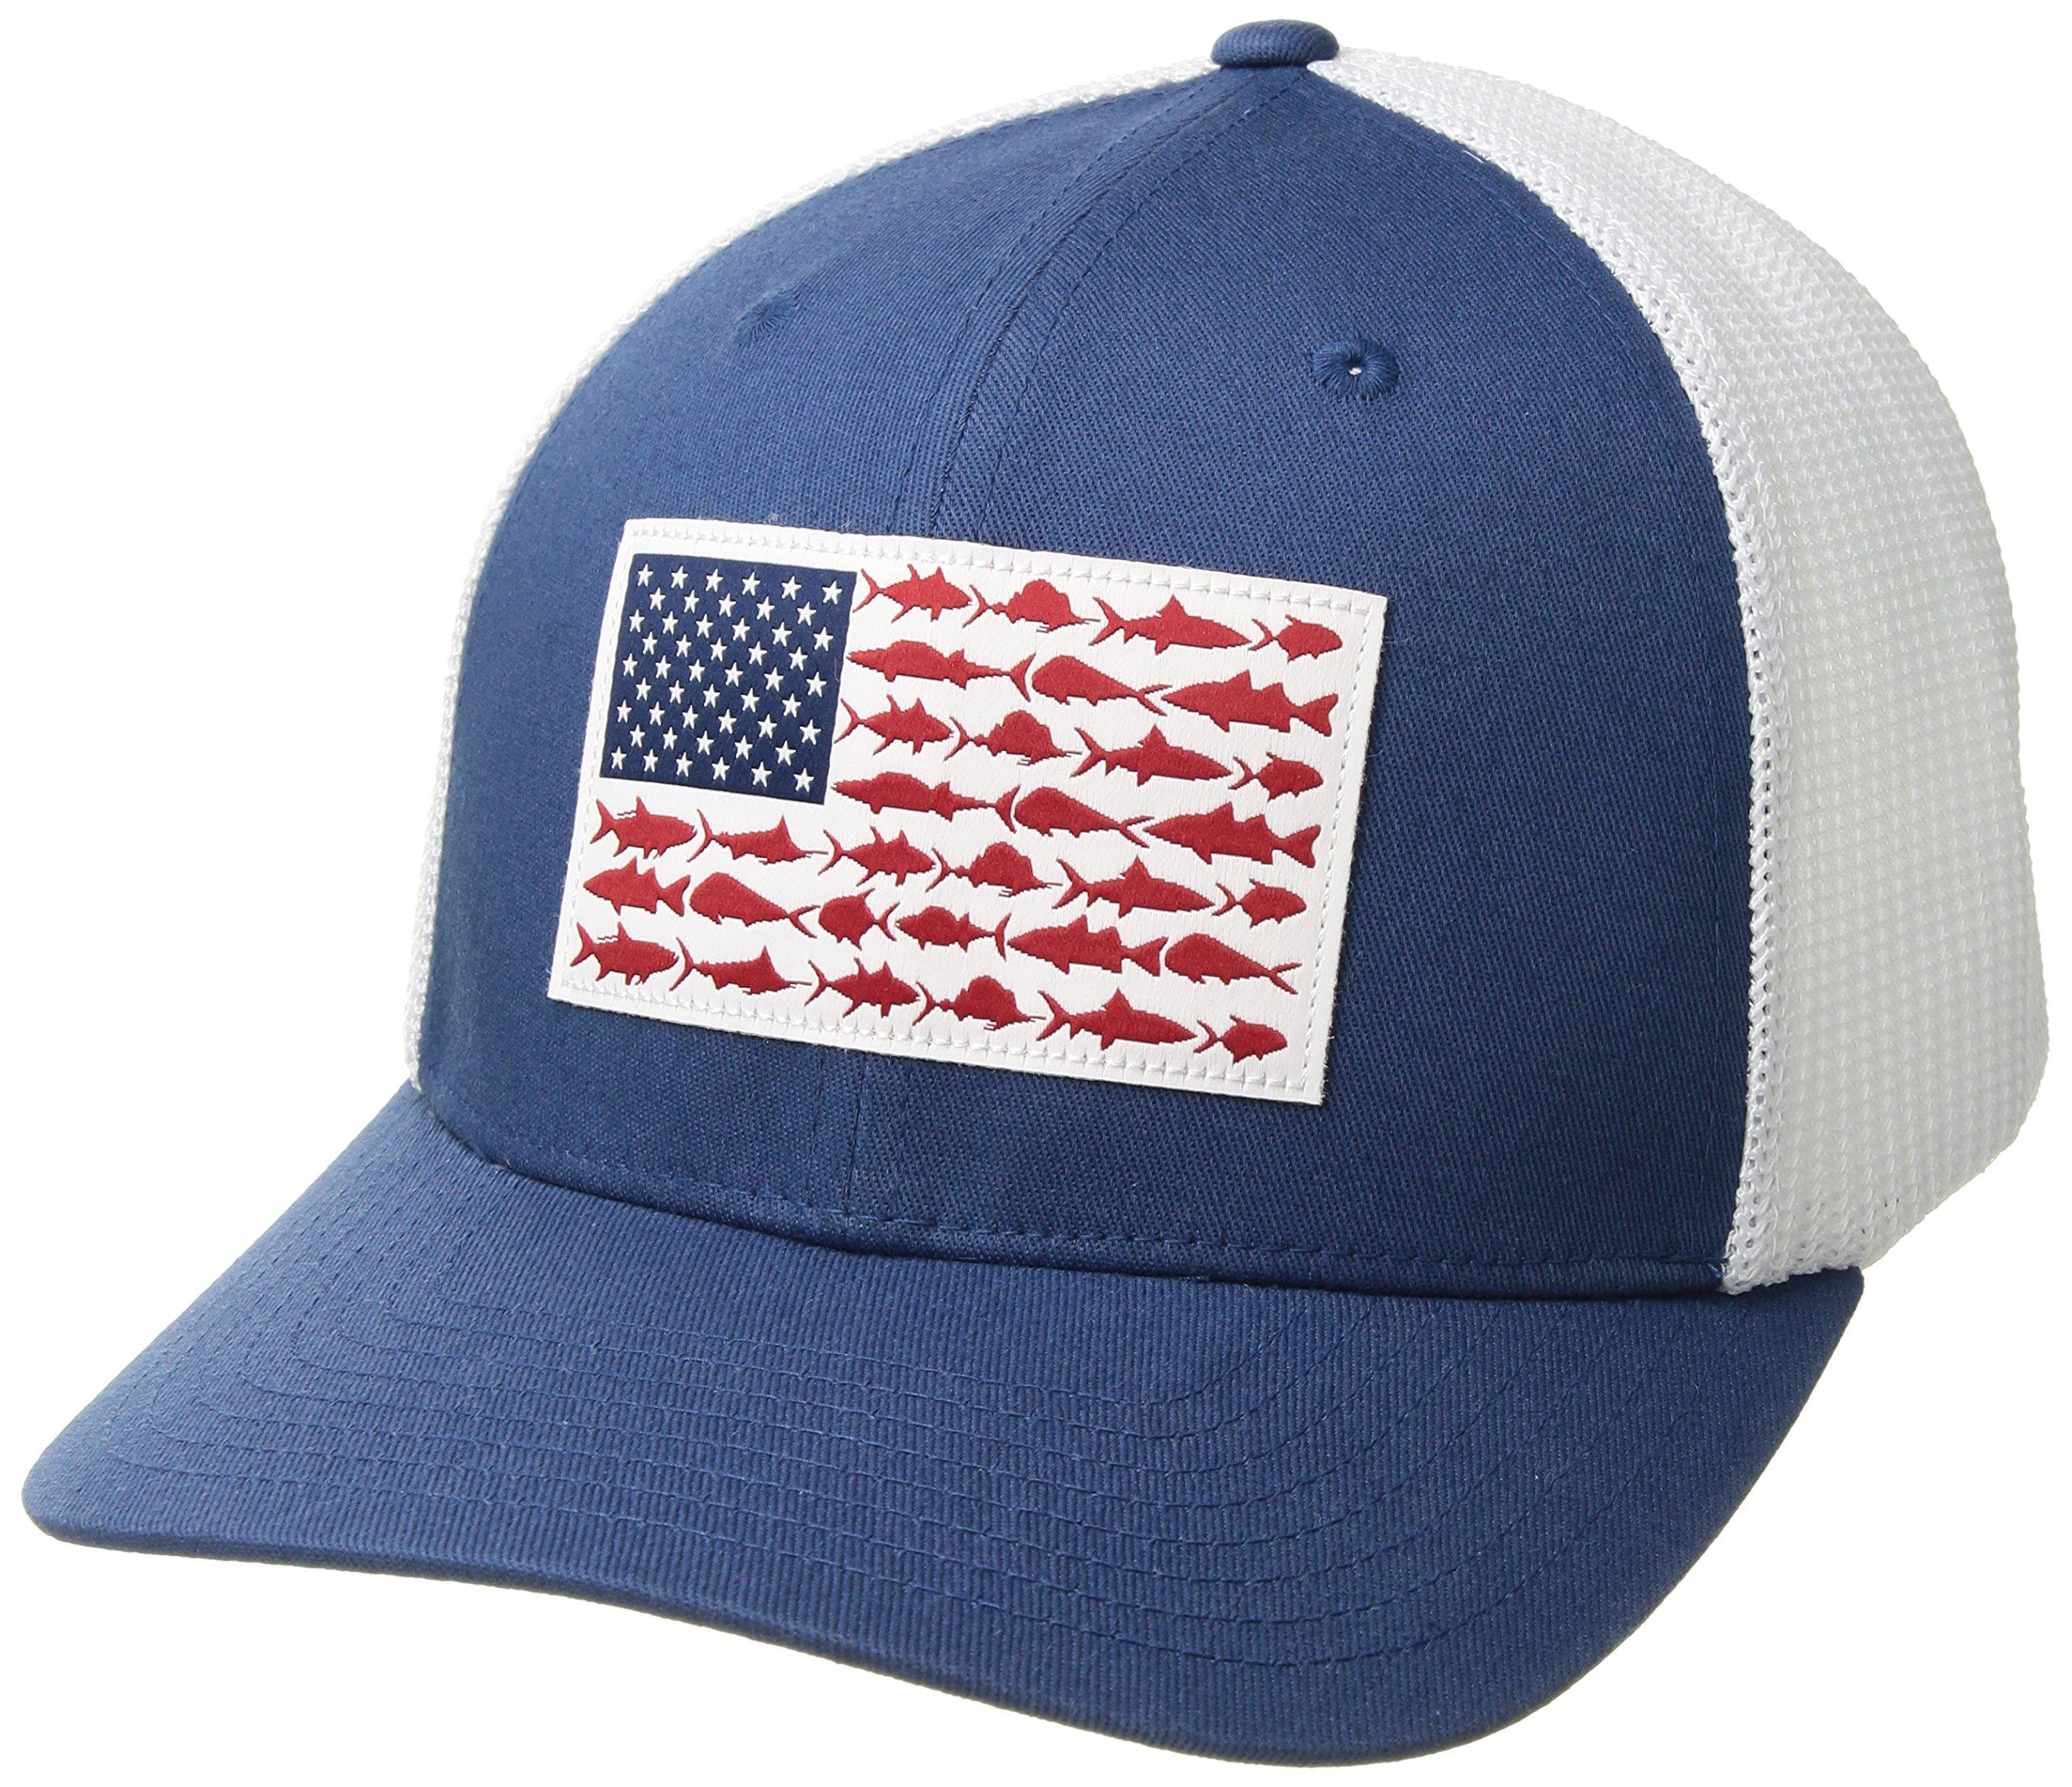 Columbia PFG Mesh Ball Cap, Night Tide/Fish Flag, Large/X-Large